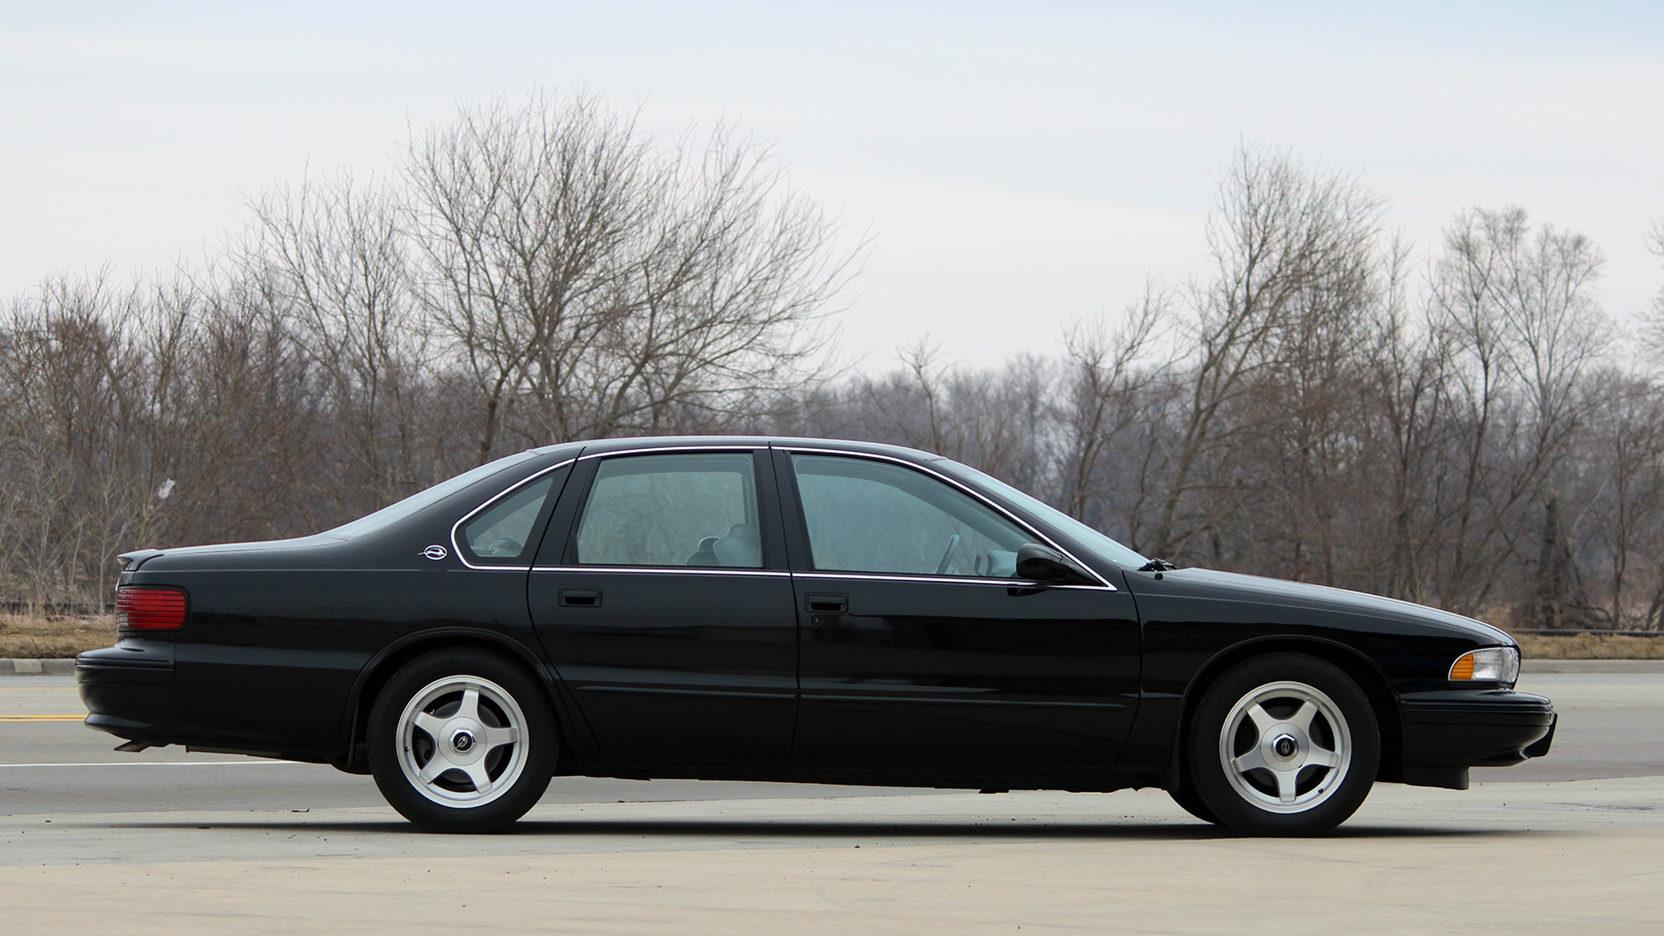 1995 Chevrolet Impala SS profile